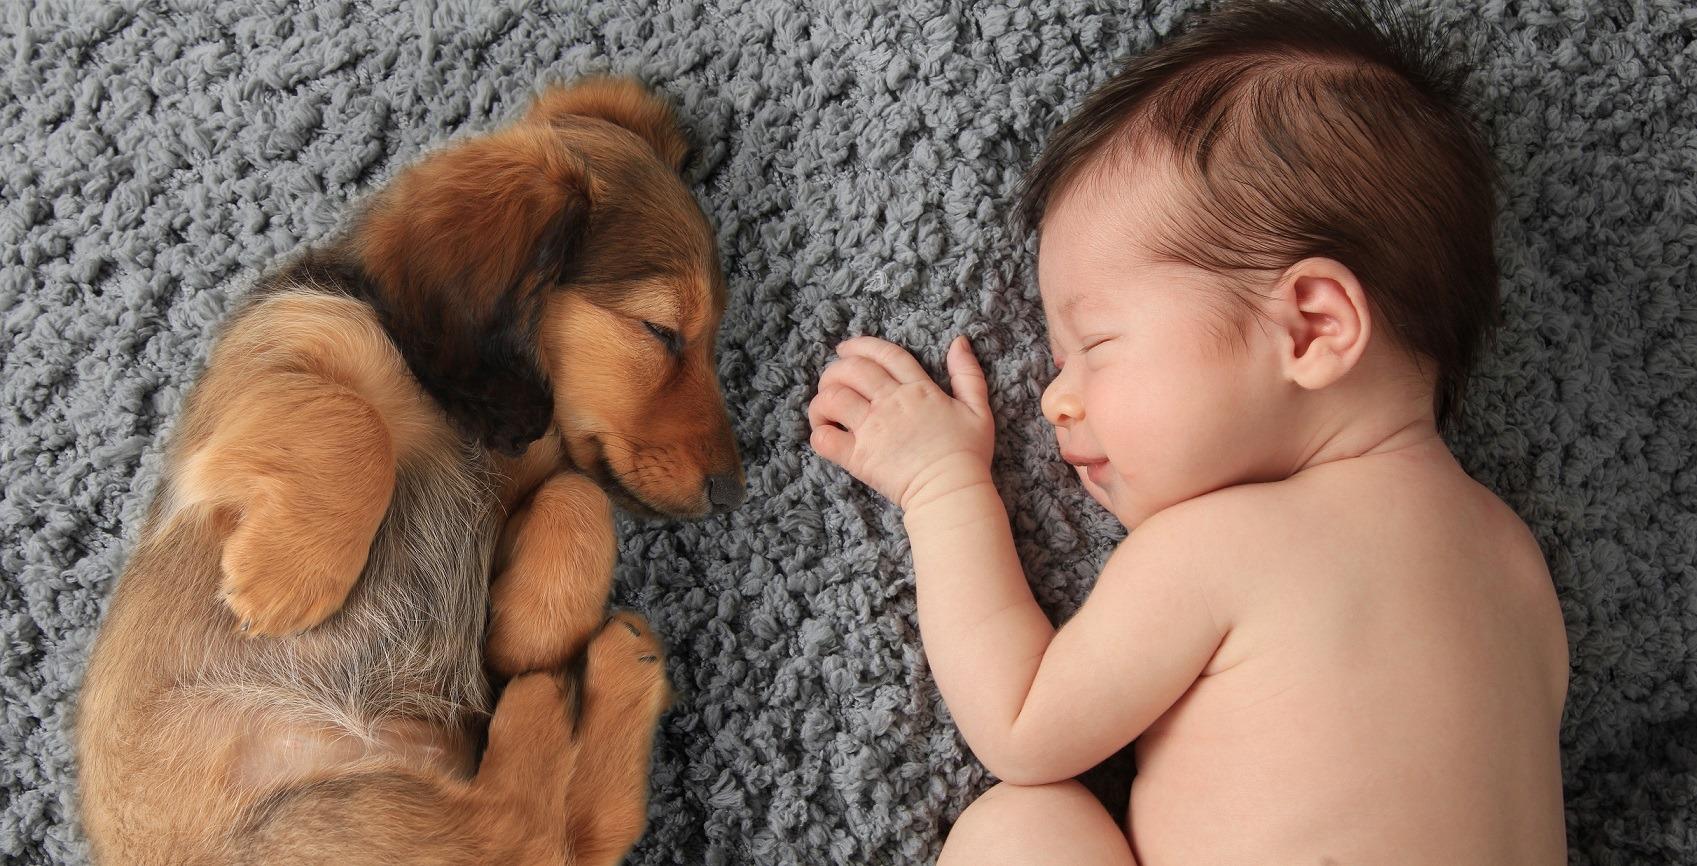 Newborn baby with dog